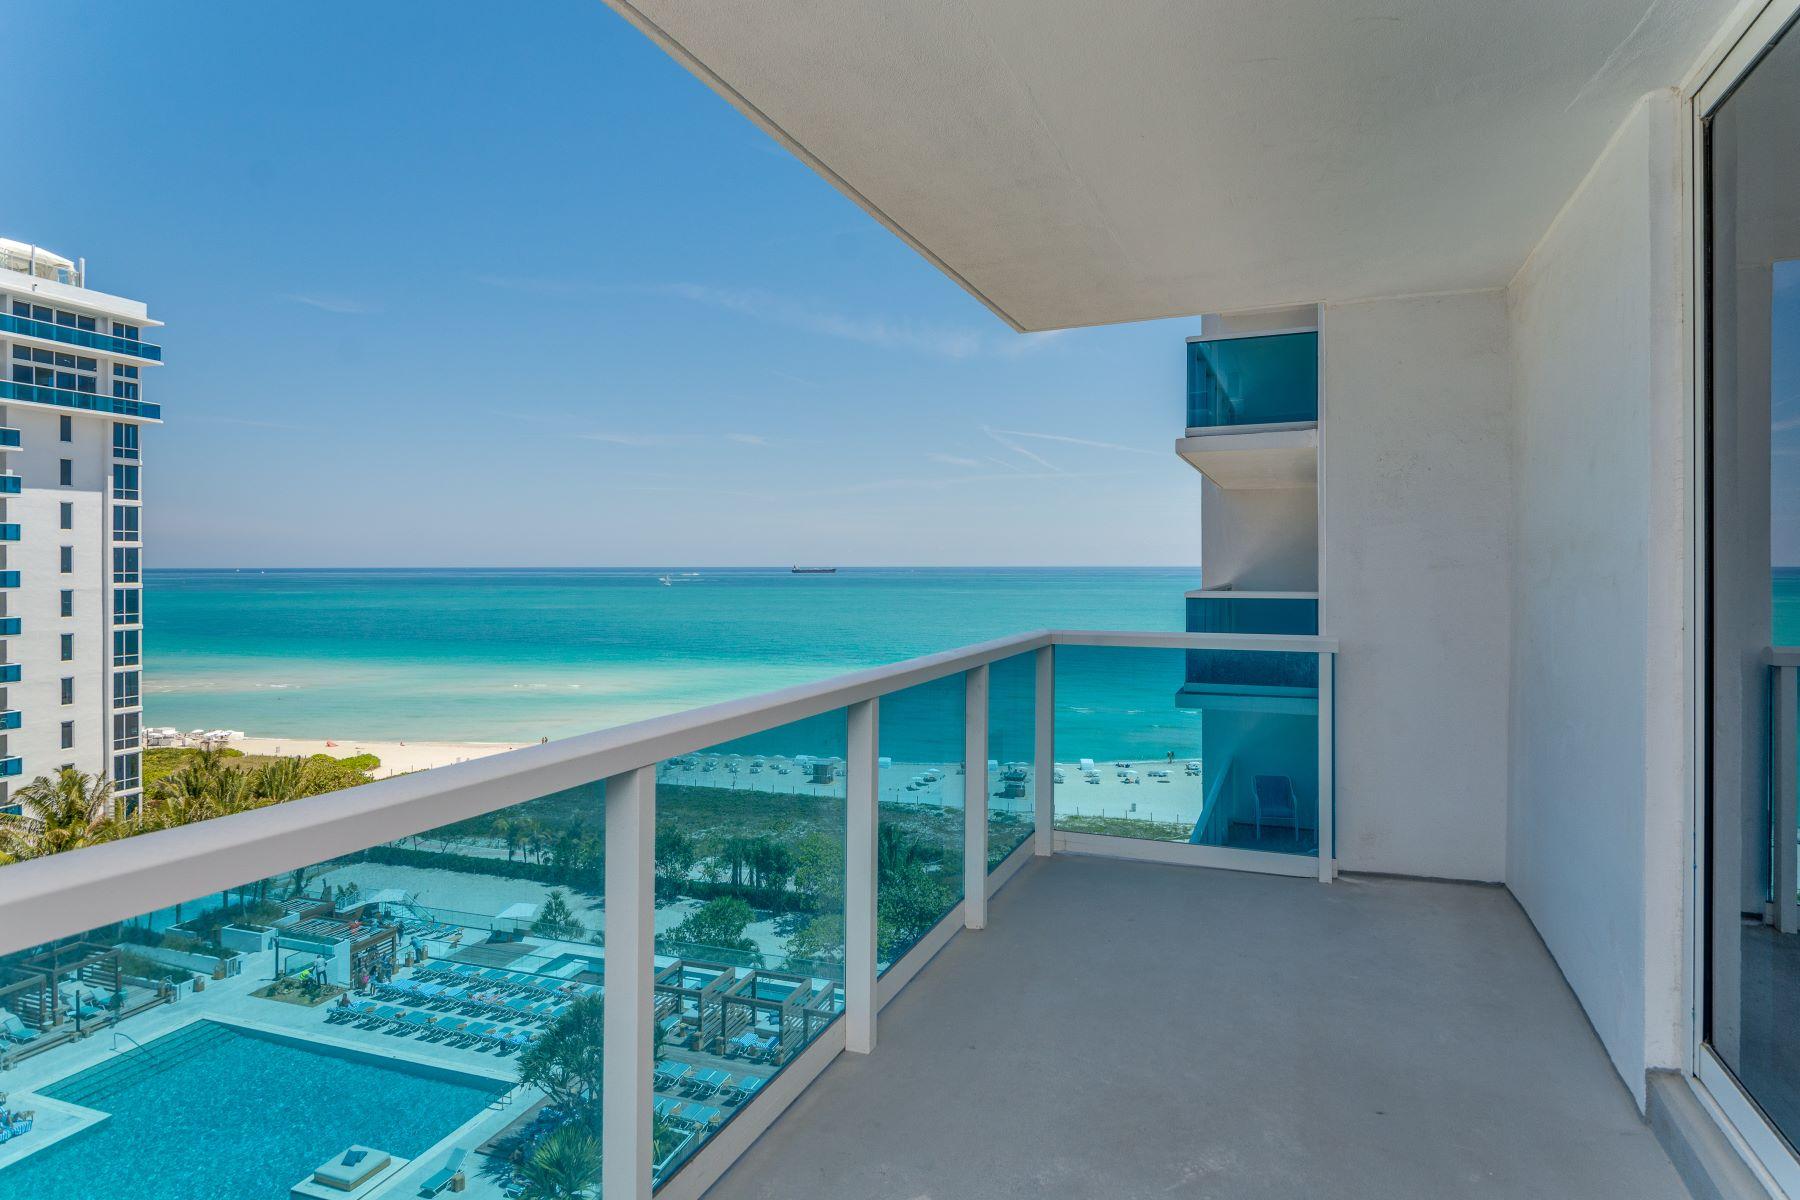 for Sale at 2301 Collins Av #1116 2301 Collins Av 1116 Miami Beach, Florida, 33139 United States